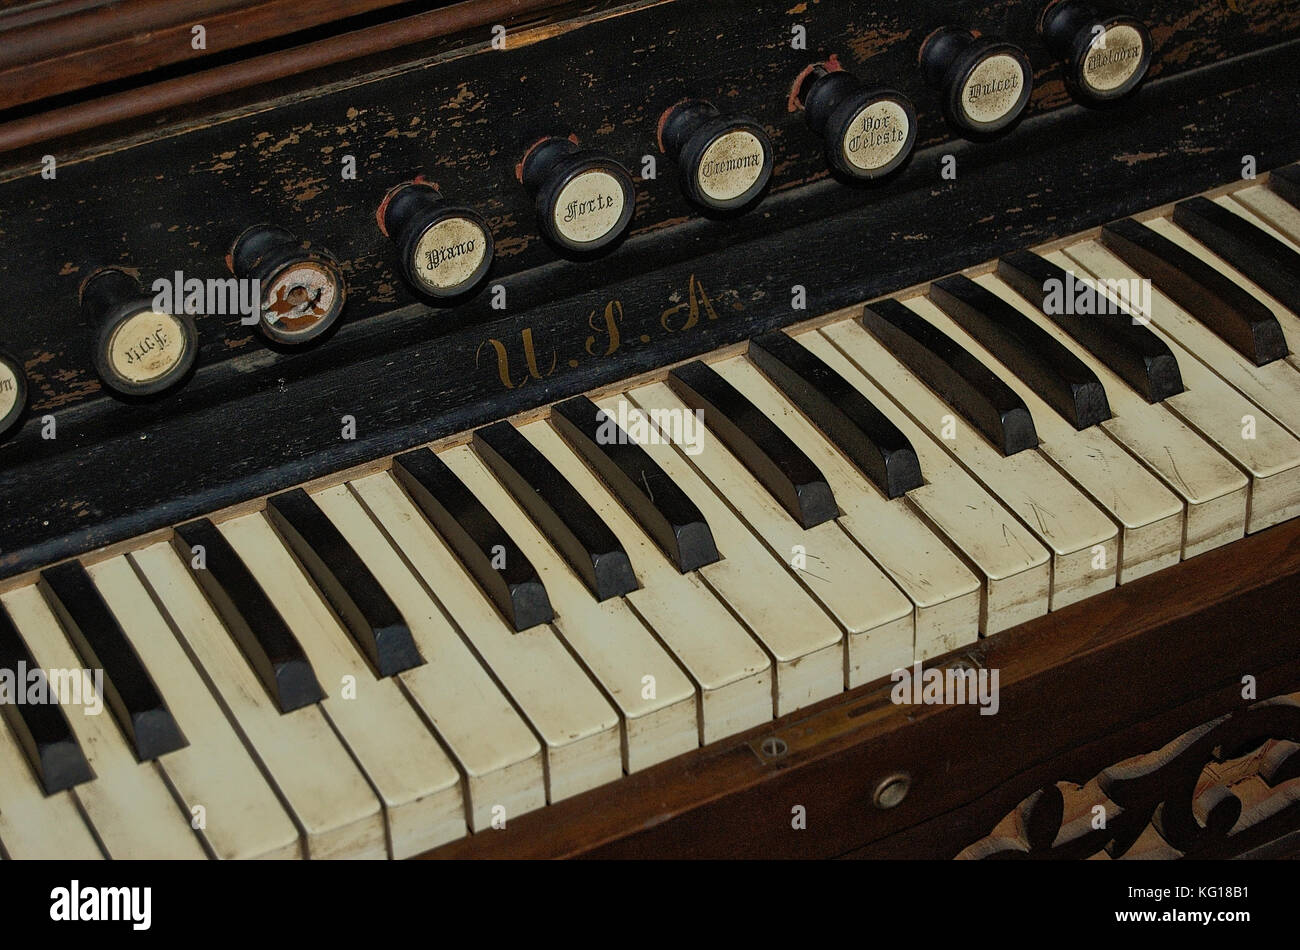 Old vintage pipe organ - Stock Image